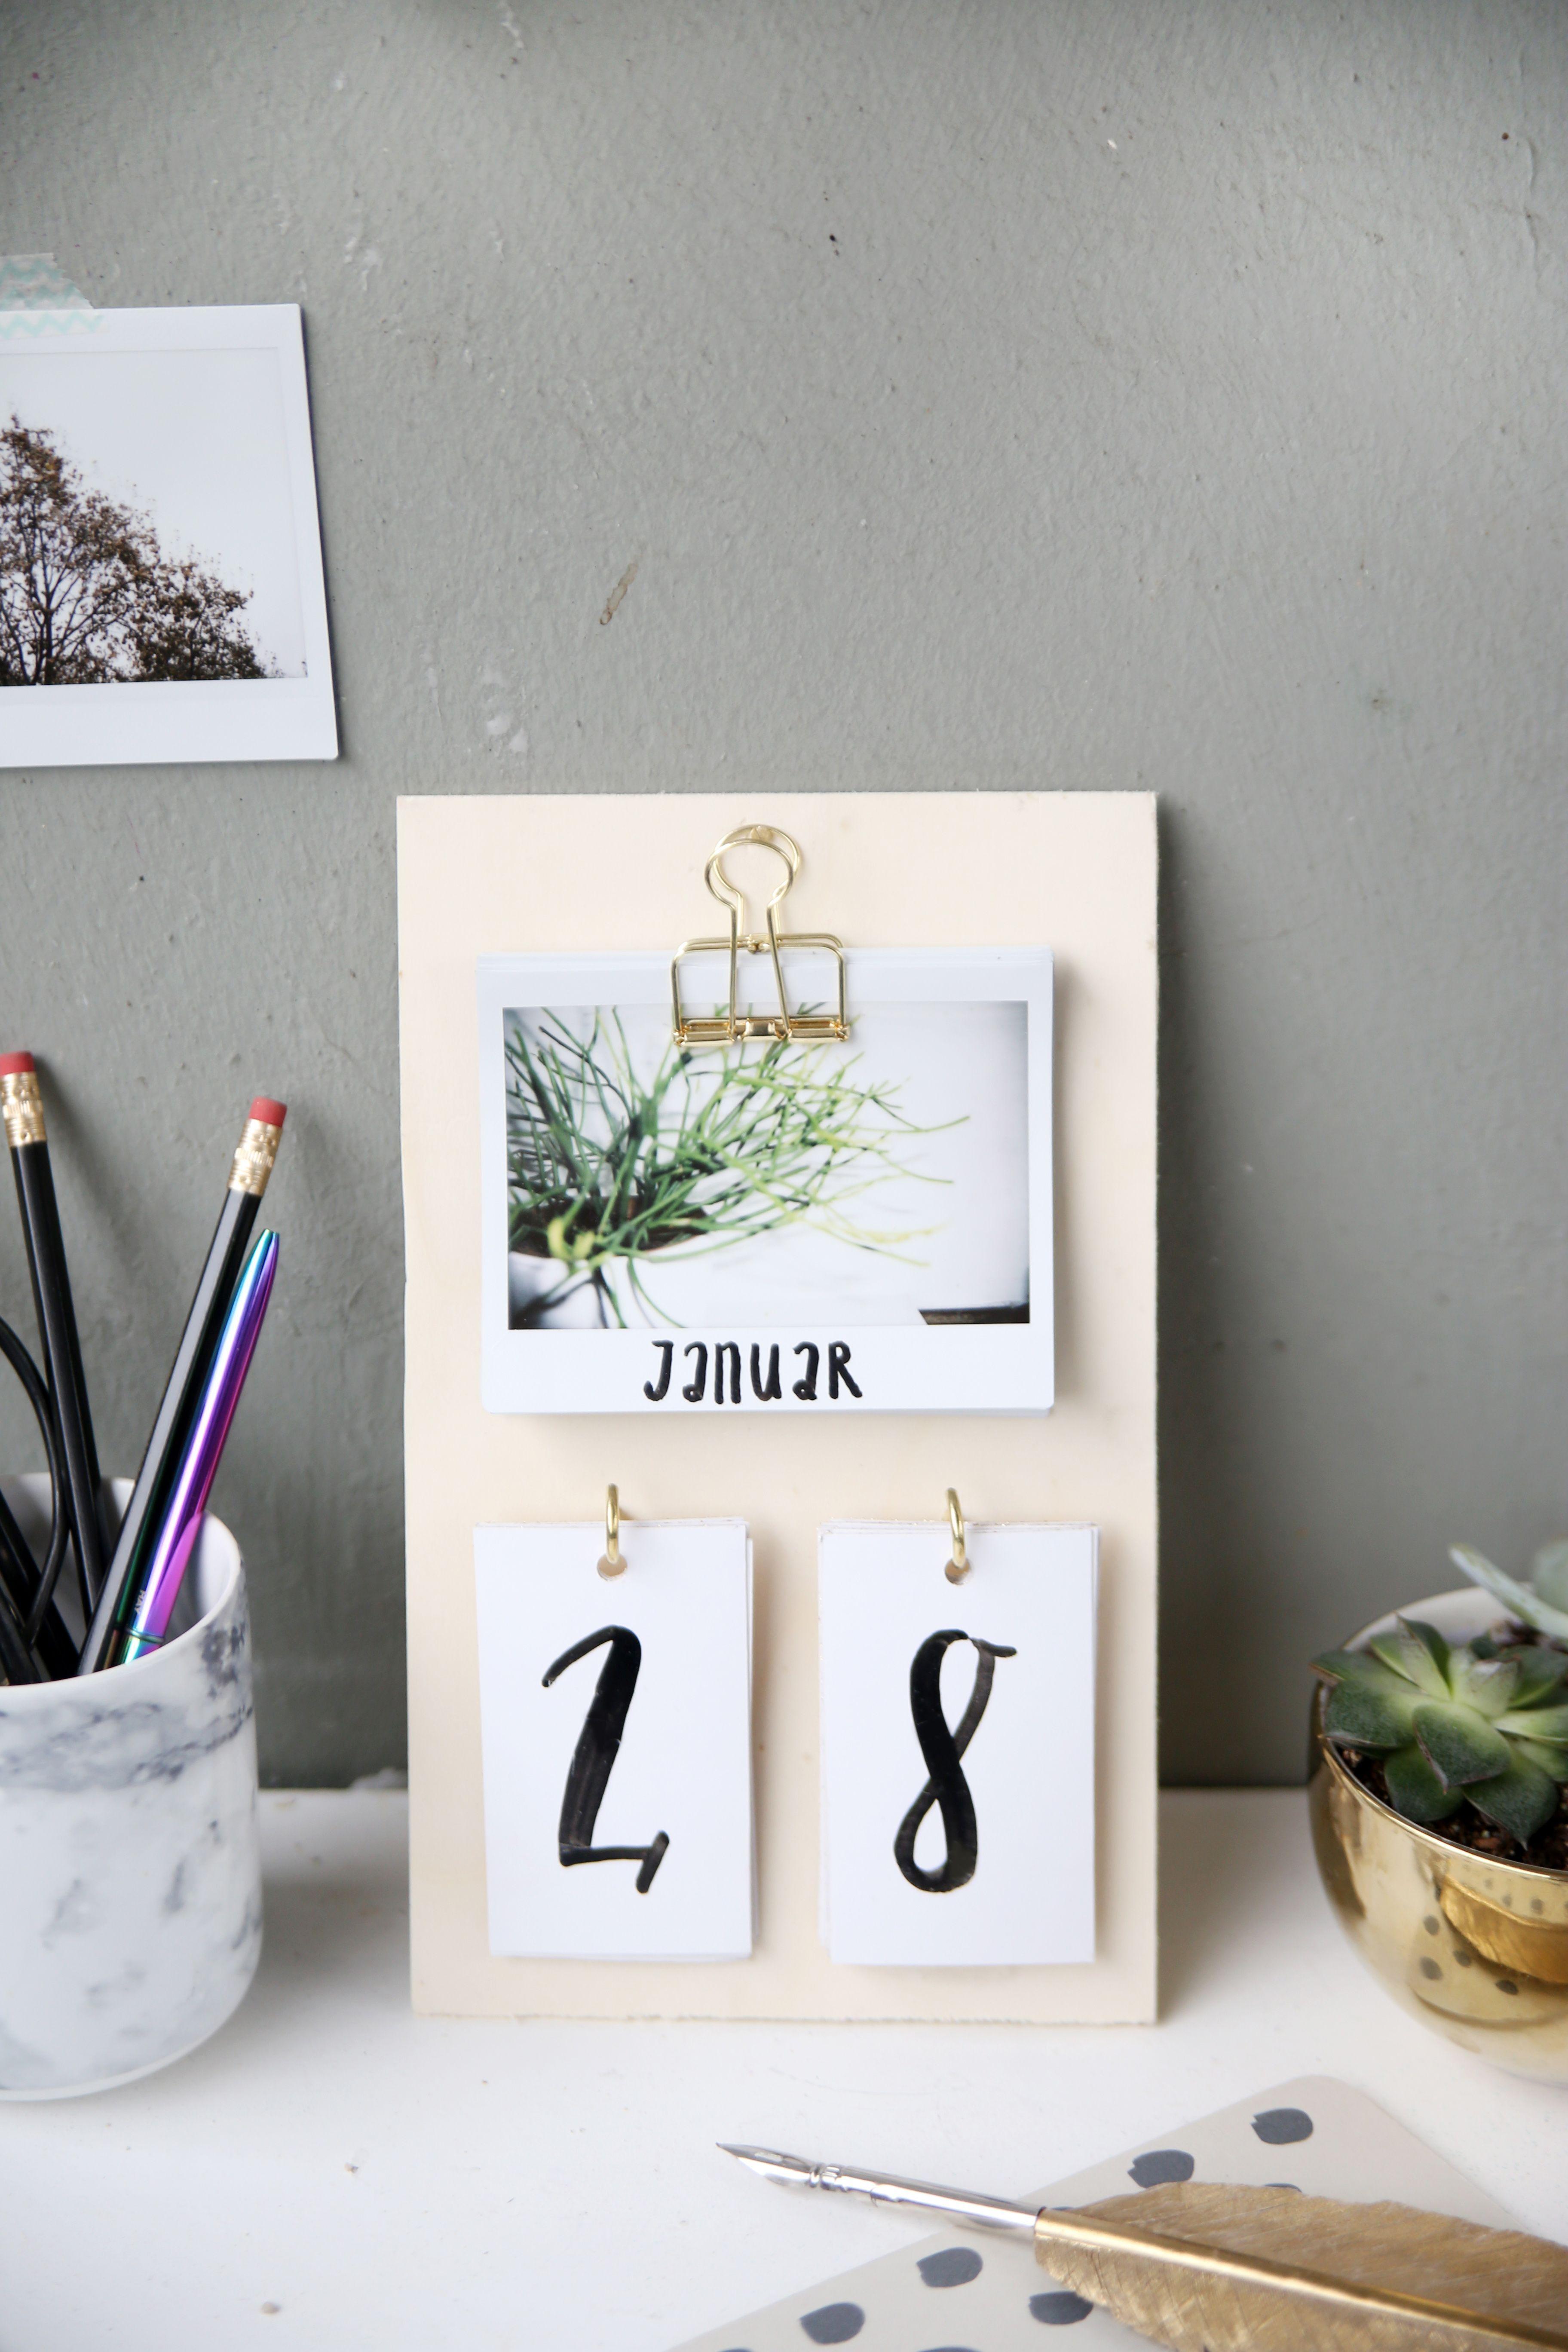 Photo of {DIY} Homemade desk calendar with Instax photos